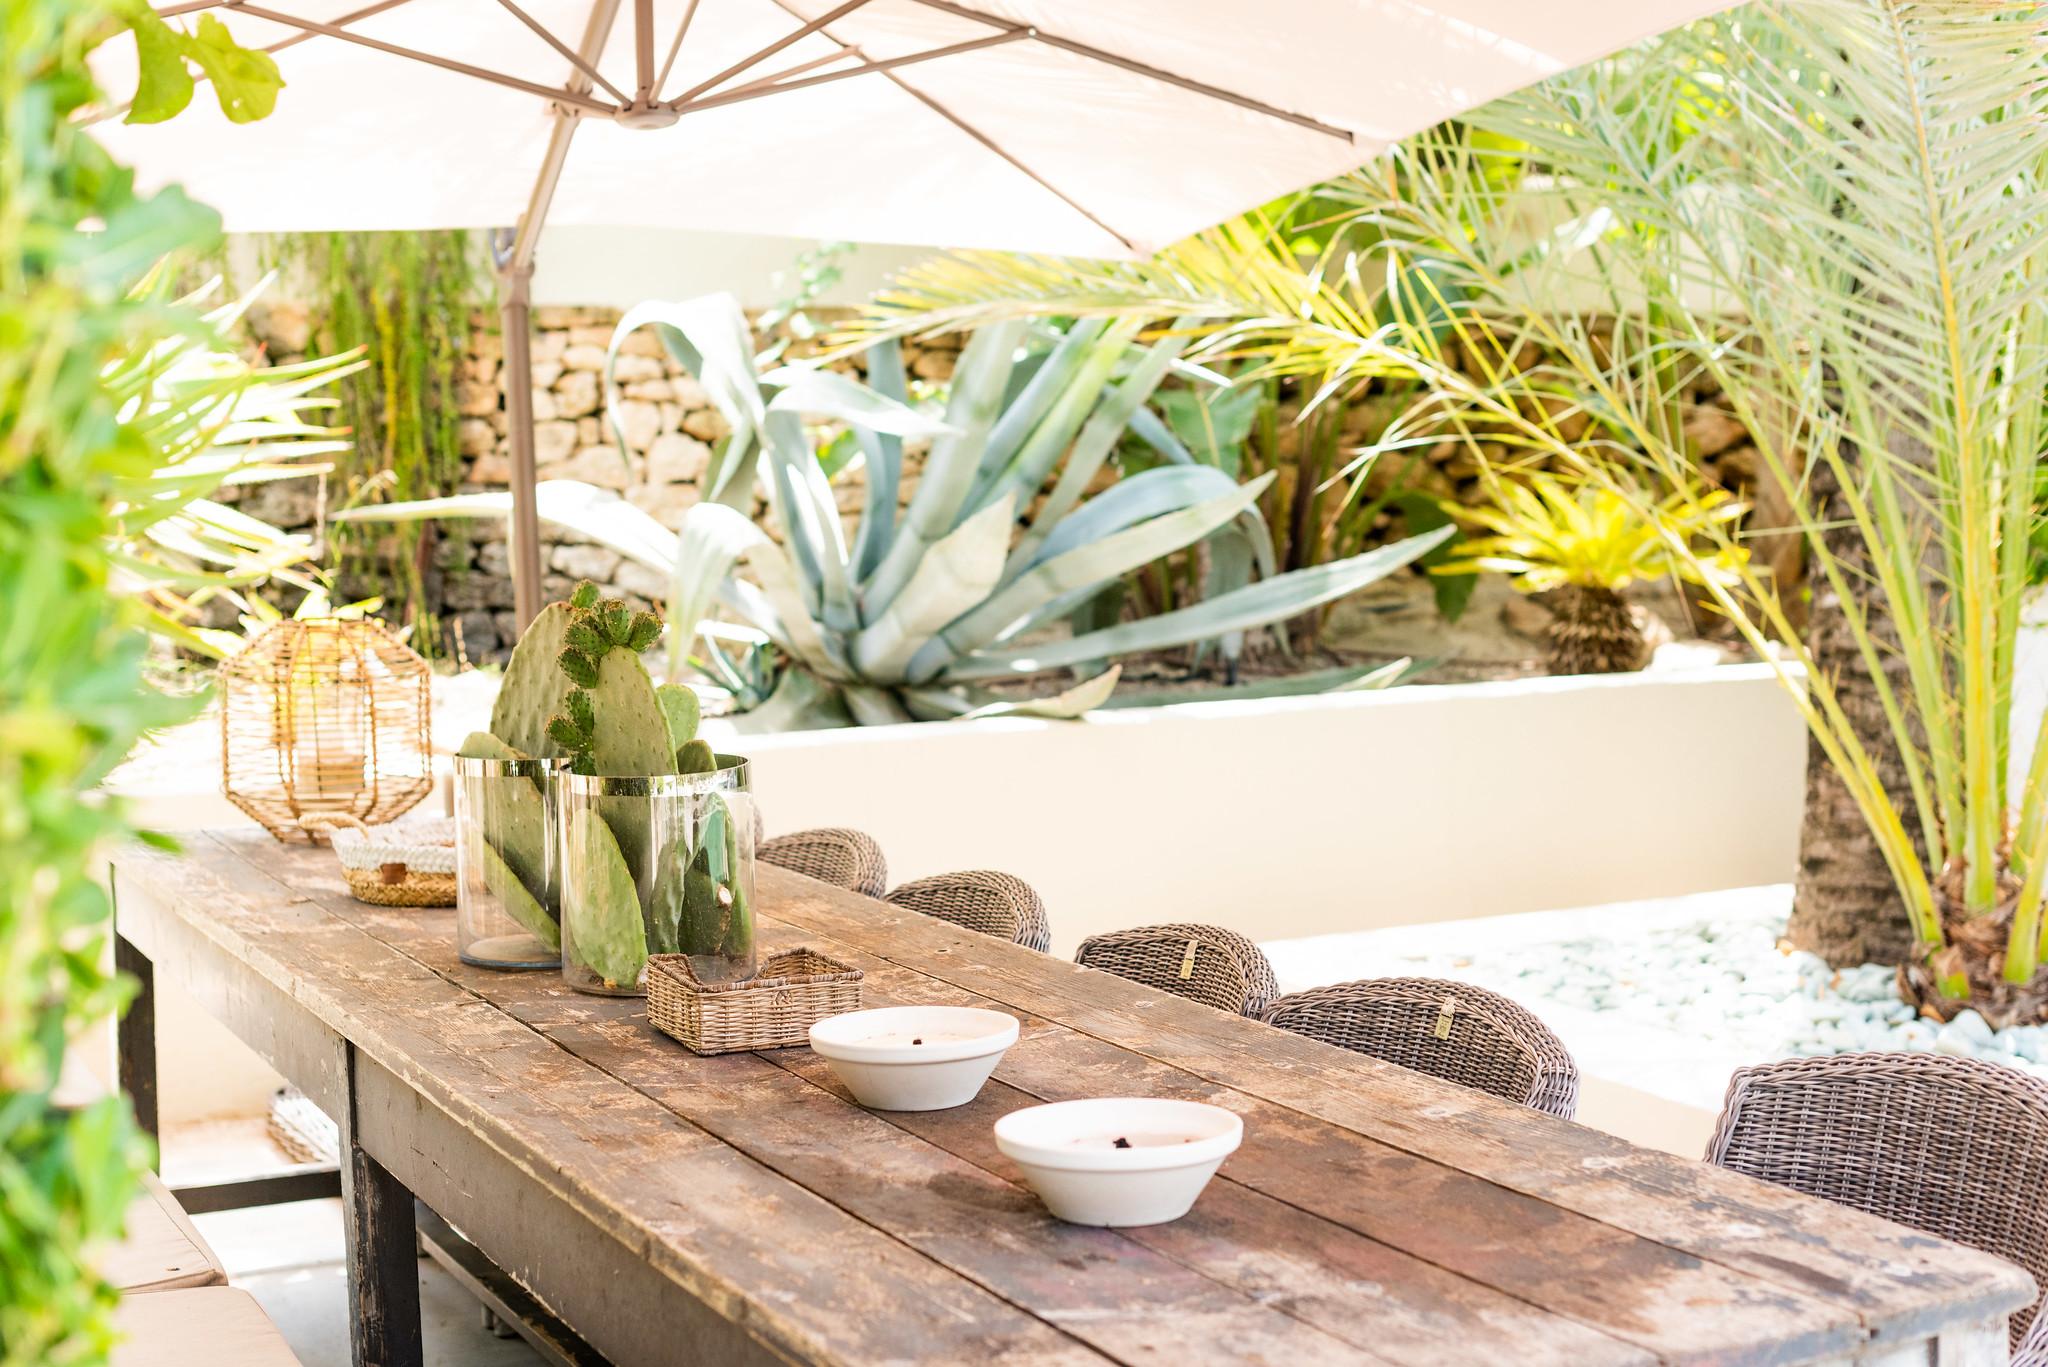 https://www.white-ibiza.com/wp-content/uploads/2020/05/white-ibiza-villas-can-riviere-exterior-table.jpg